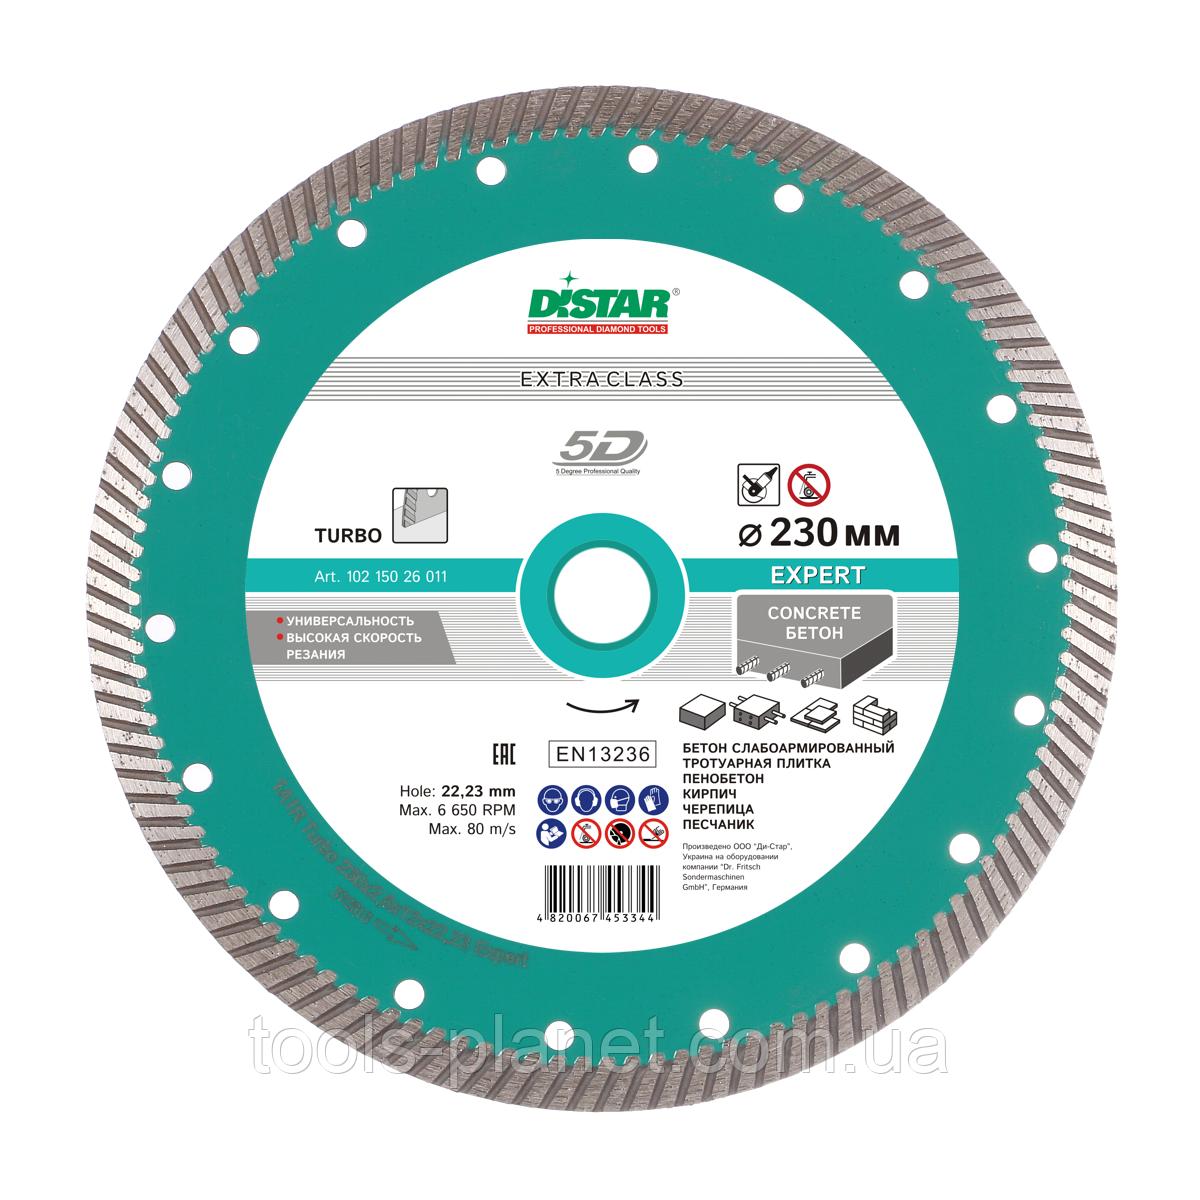 Алмазный диск Distar 1A1R Turbo 230 x 2,6 x 12 x 22,23 Expert 5D (10215026011)